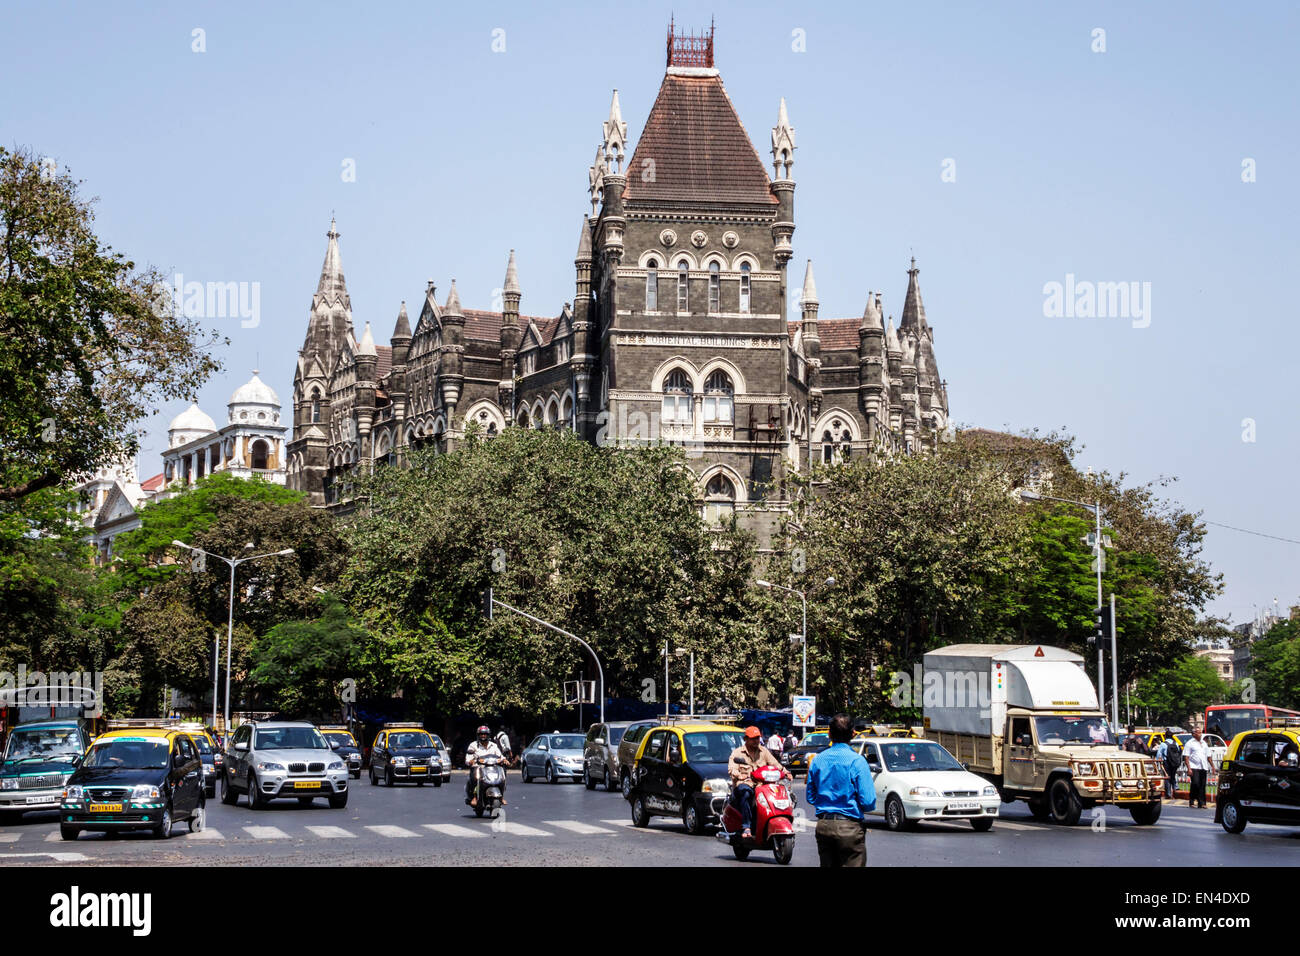 Mumbai India Asian Fort Mumbai Mahatma Gandhi Road Oriental Buildings traffic cars automobiles pedestrian - Stock Image